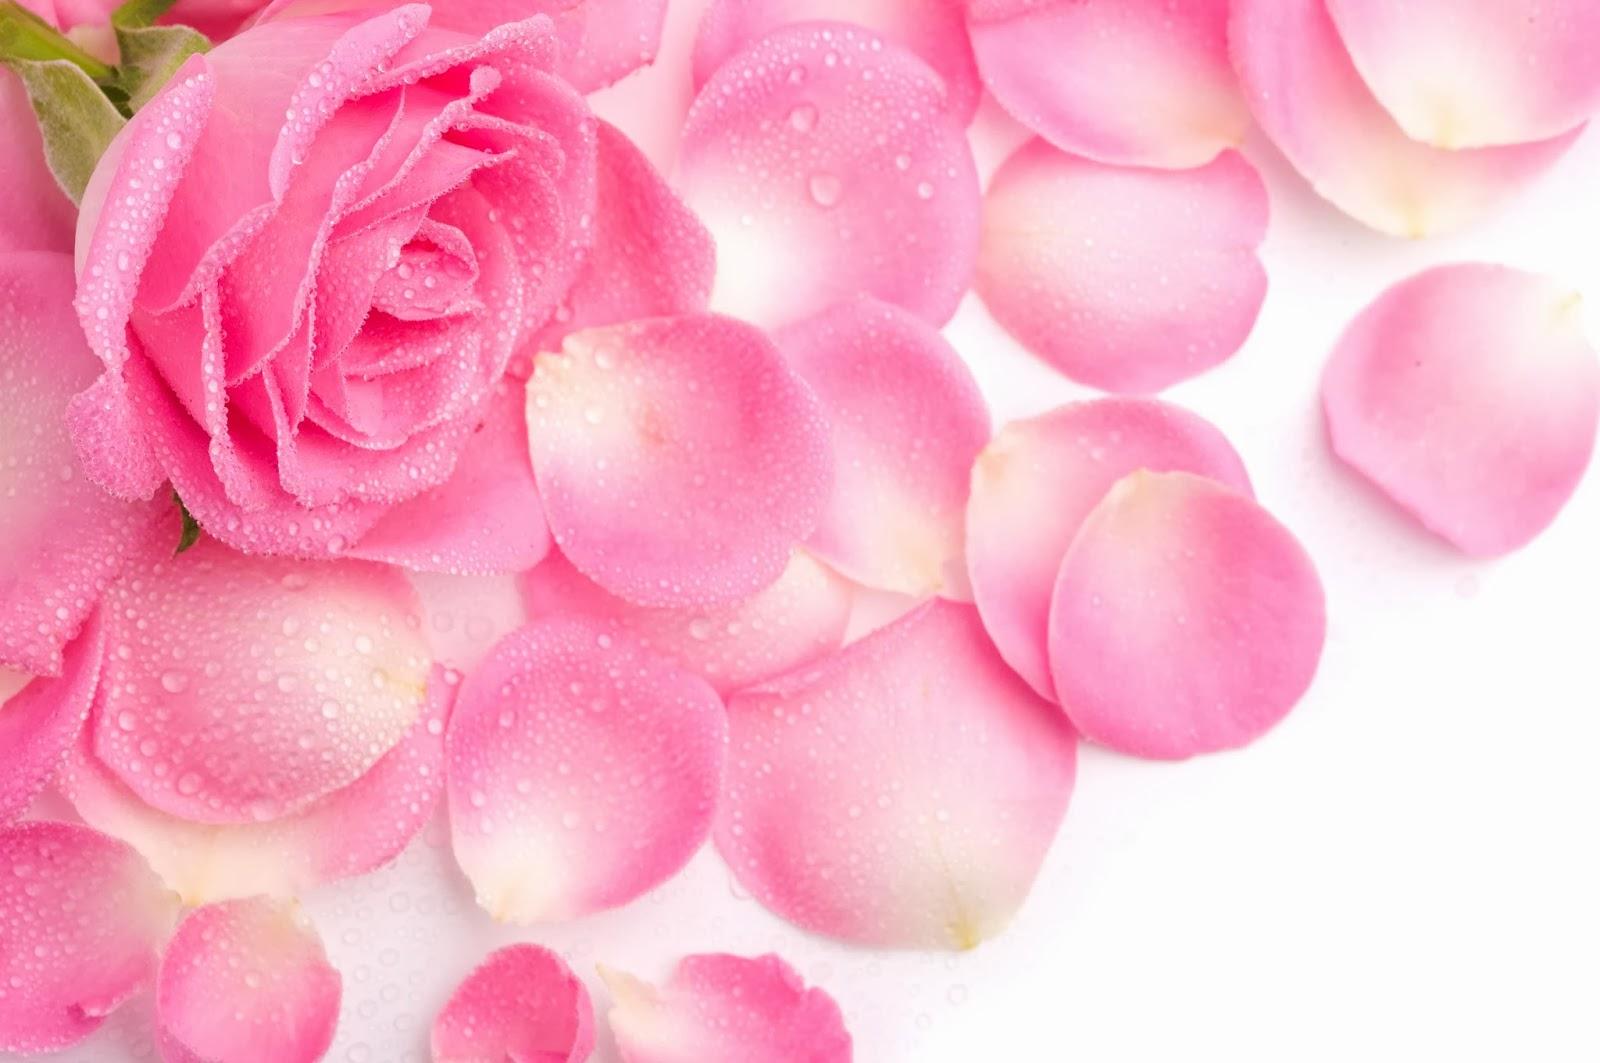 All 4u Hd Wallpaper Free Download Beautiful Pink Rose Wallpapers